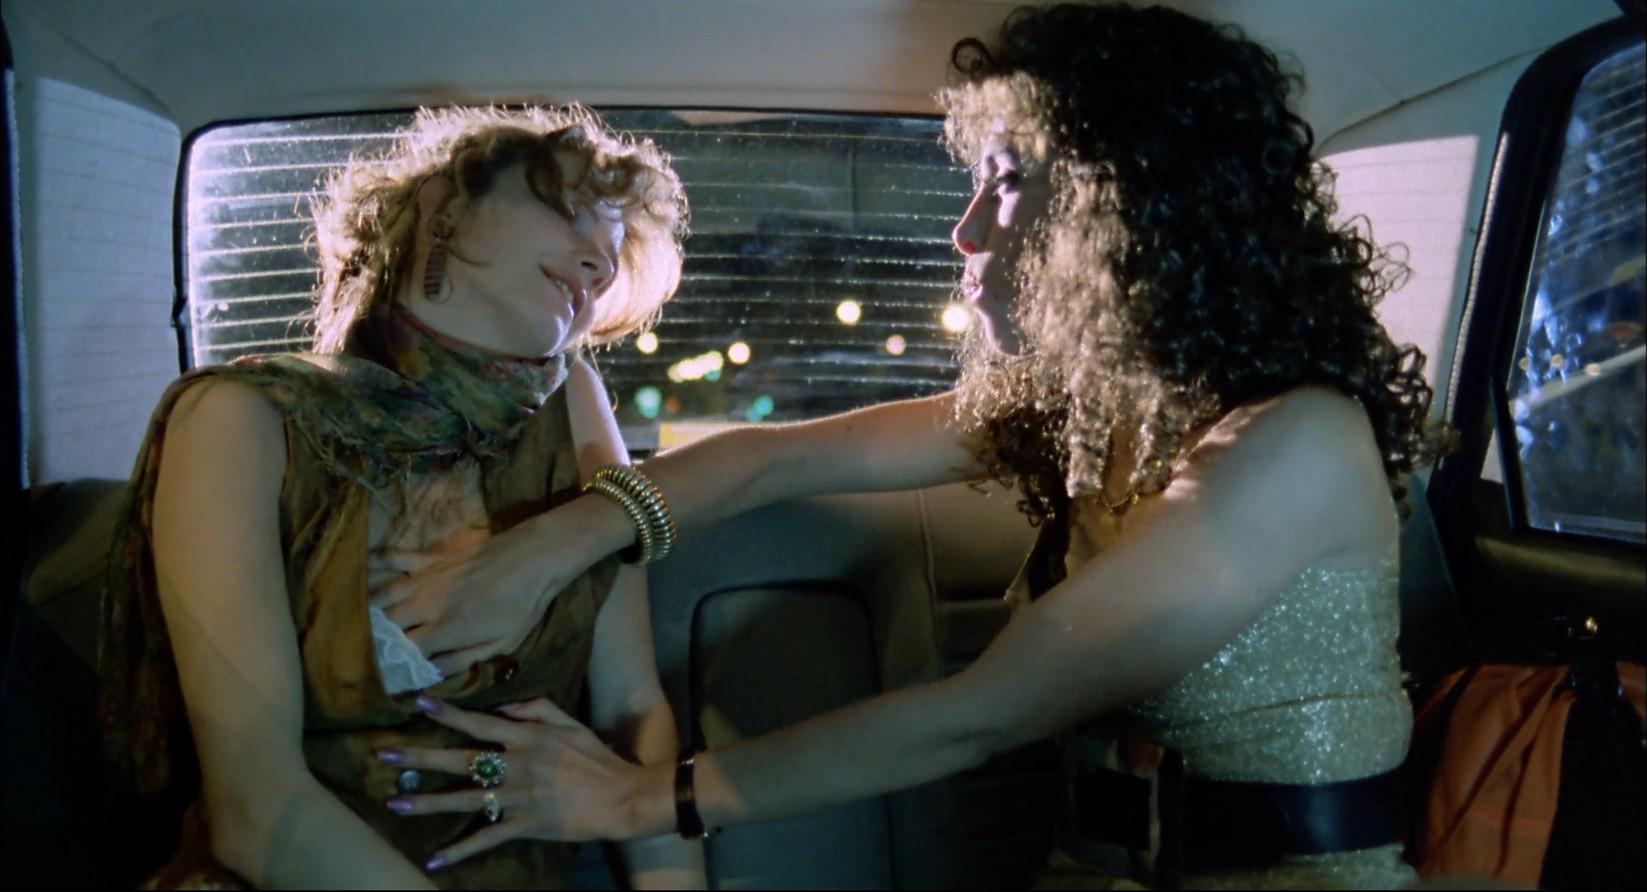 bWJXXM - Las edades de Lulú | 1990 | Drama. Erótico | BDrip 1080p | castellano DTS 5.1 | 11 GB